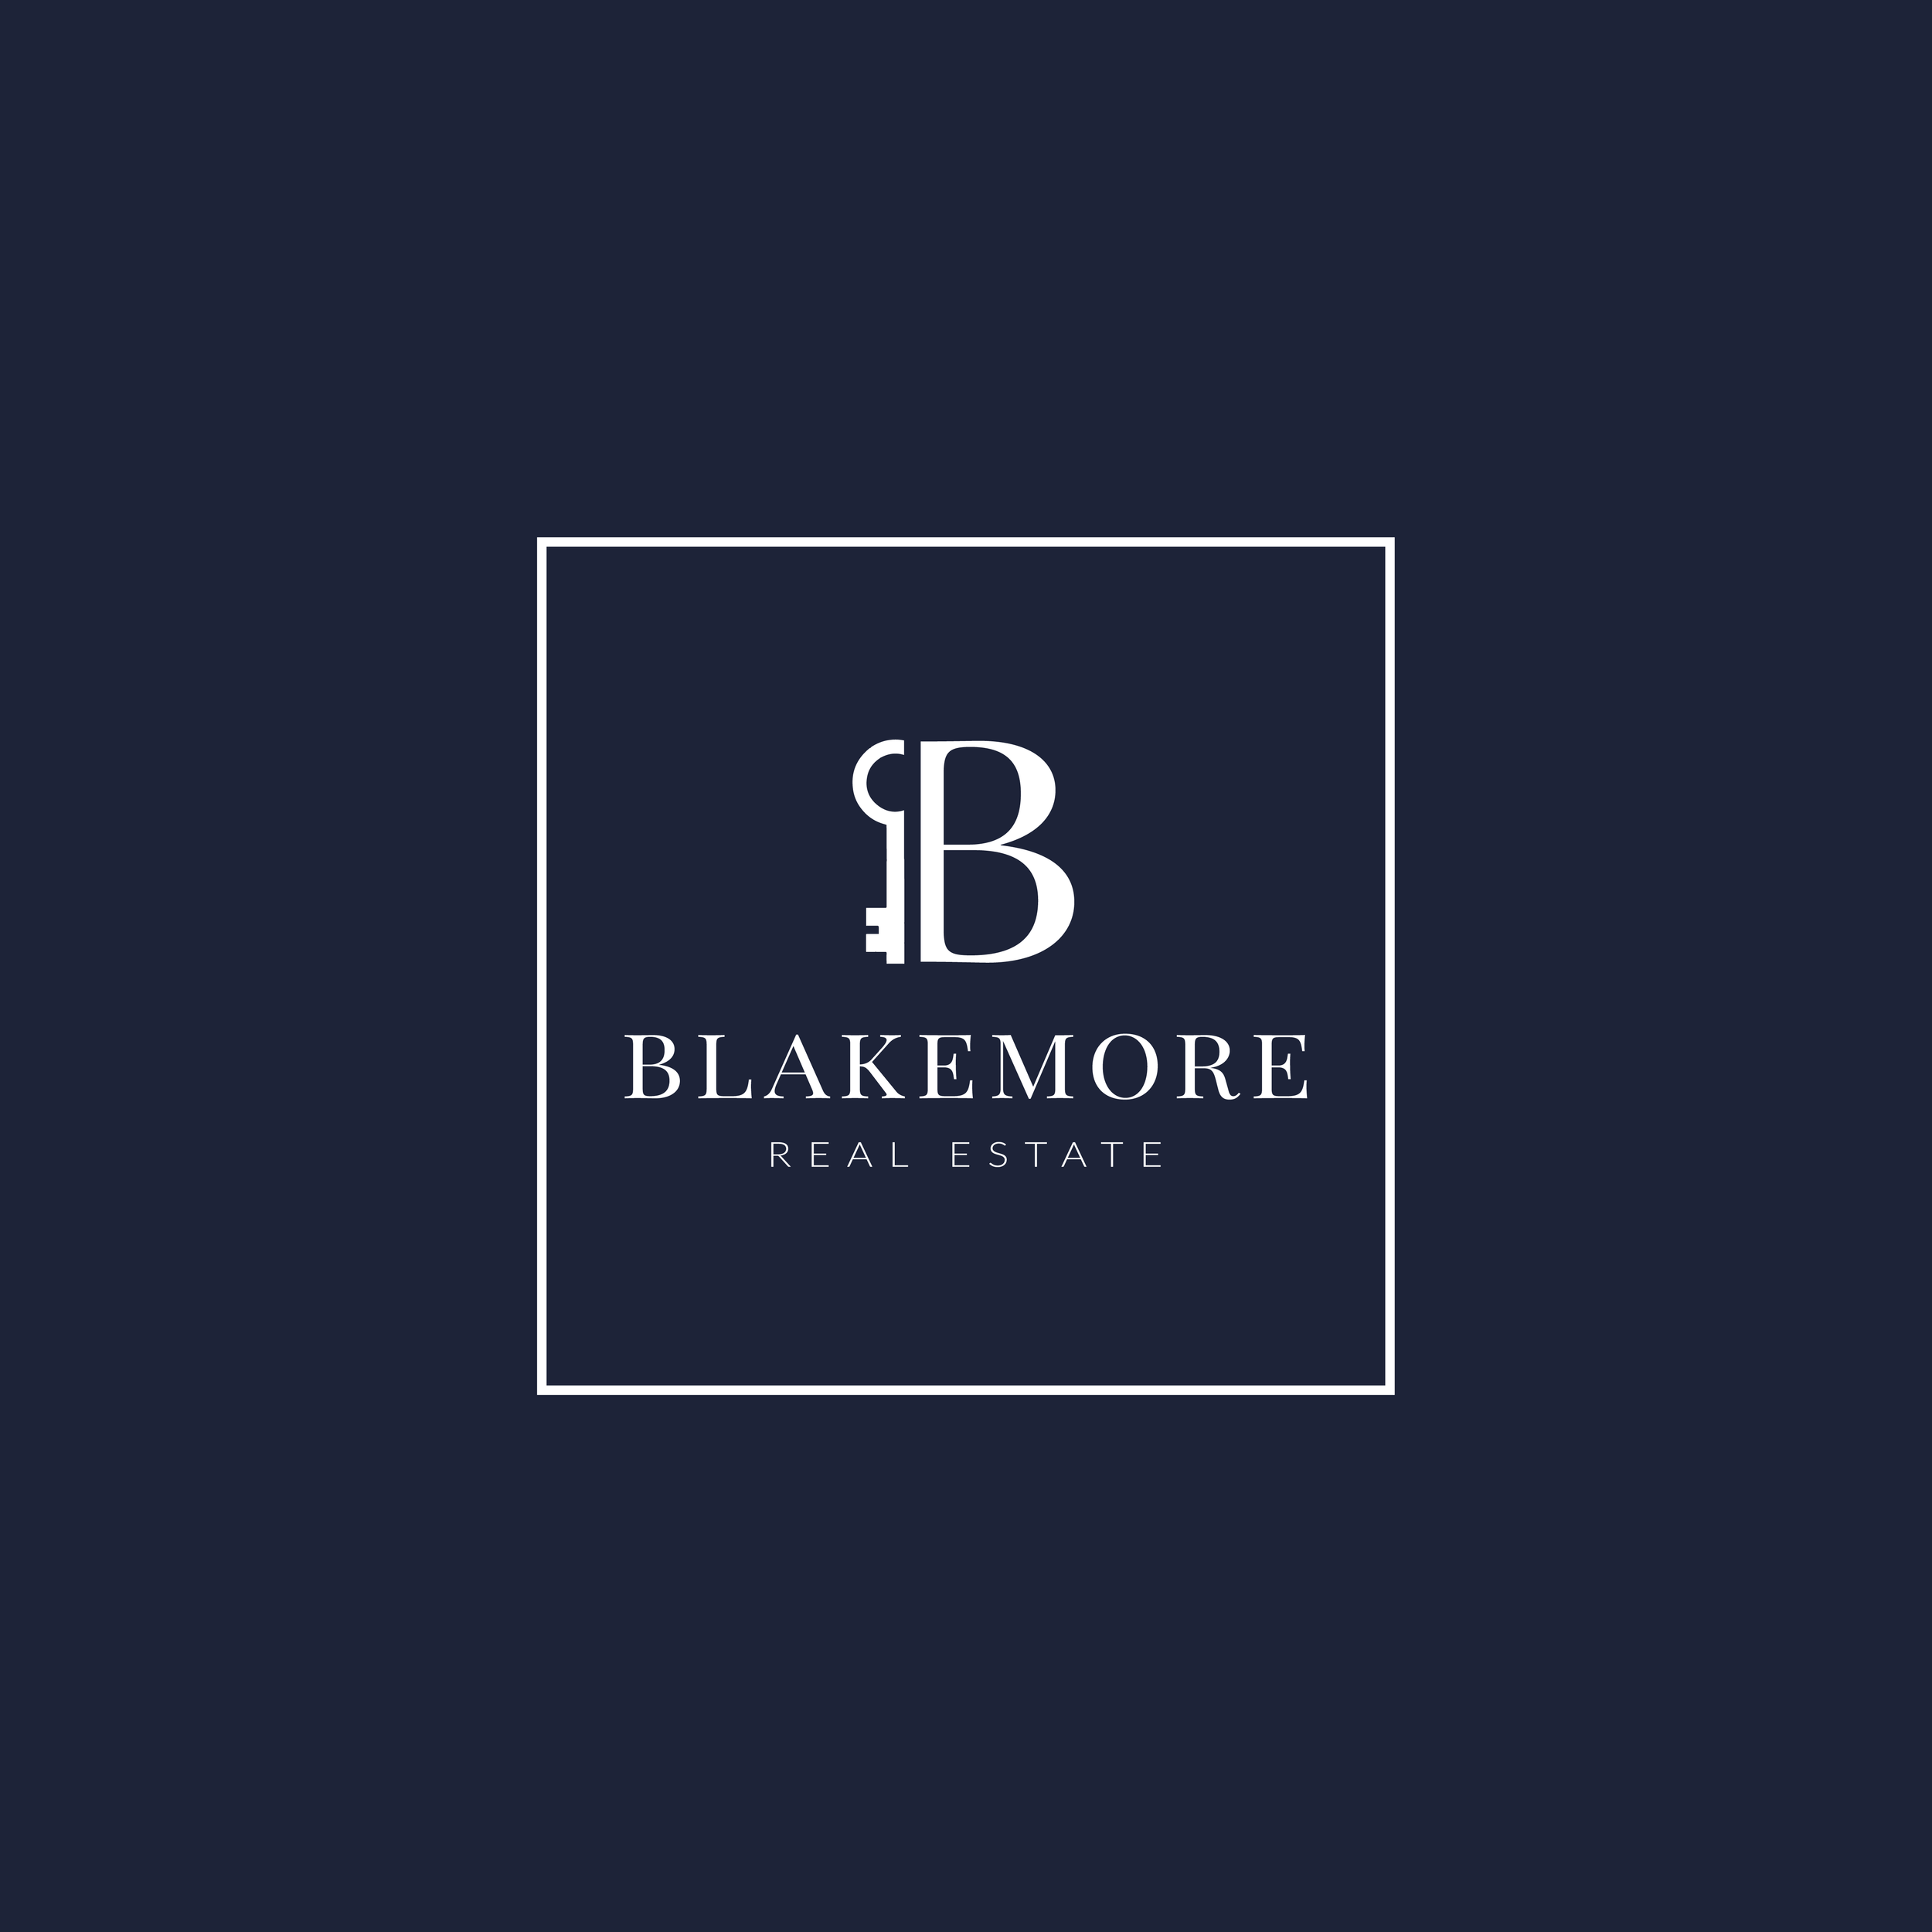 Blakemore Real Estate Social-16.png